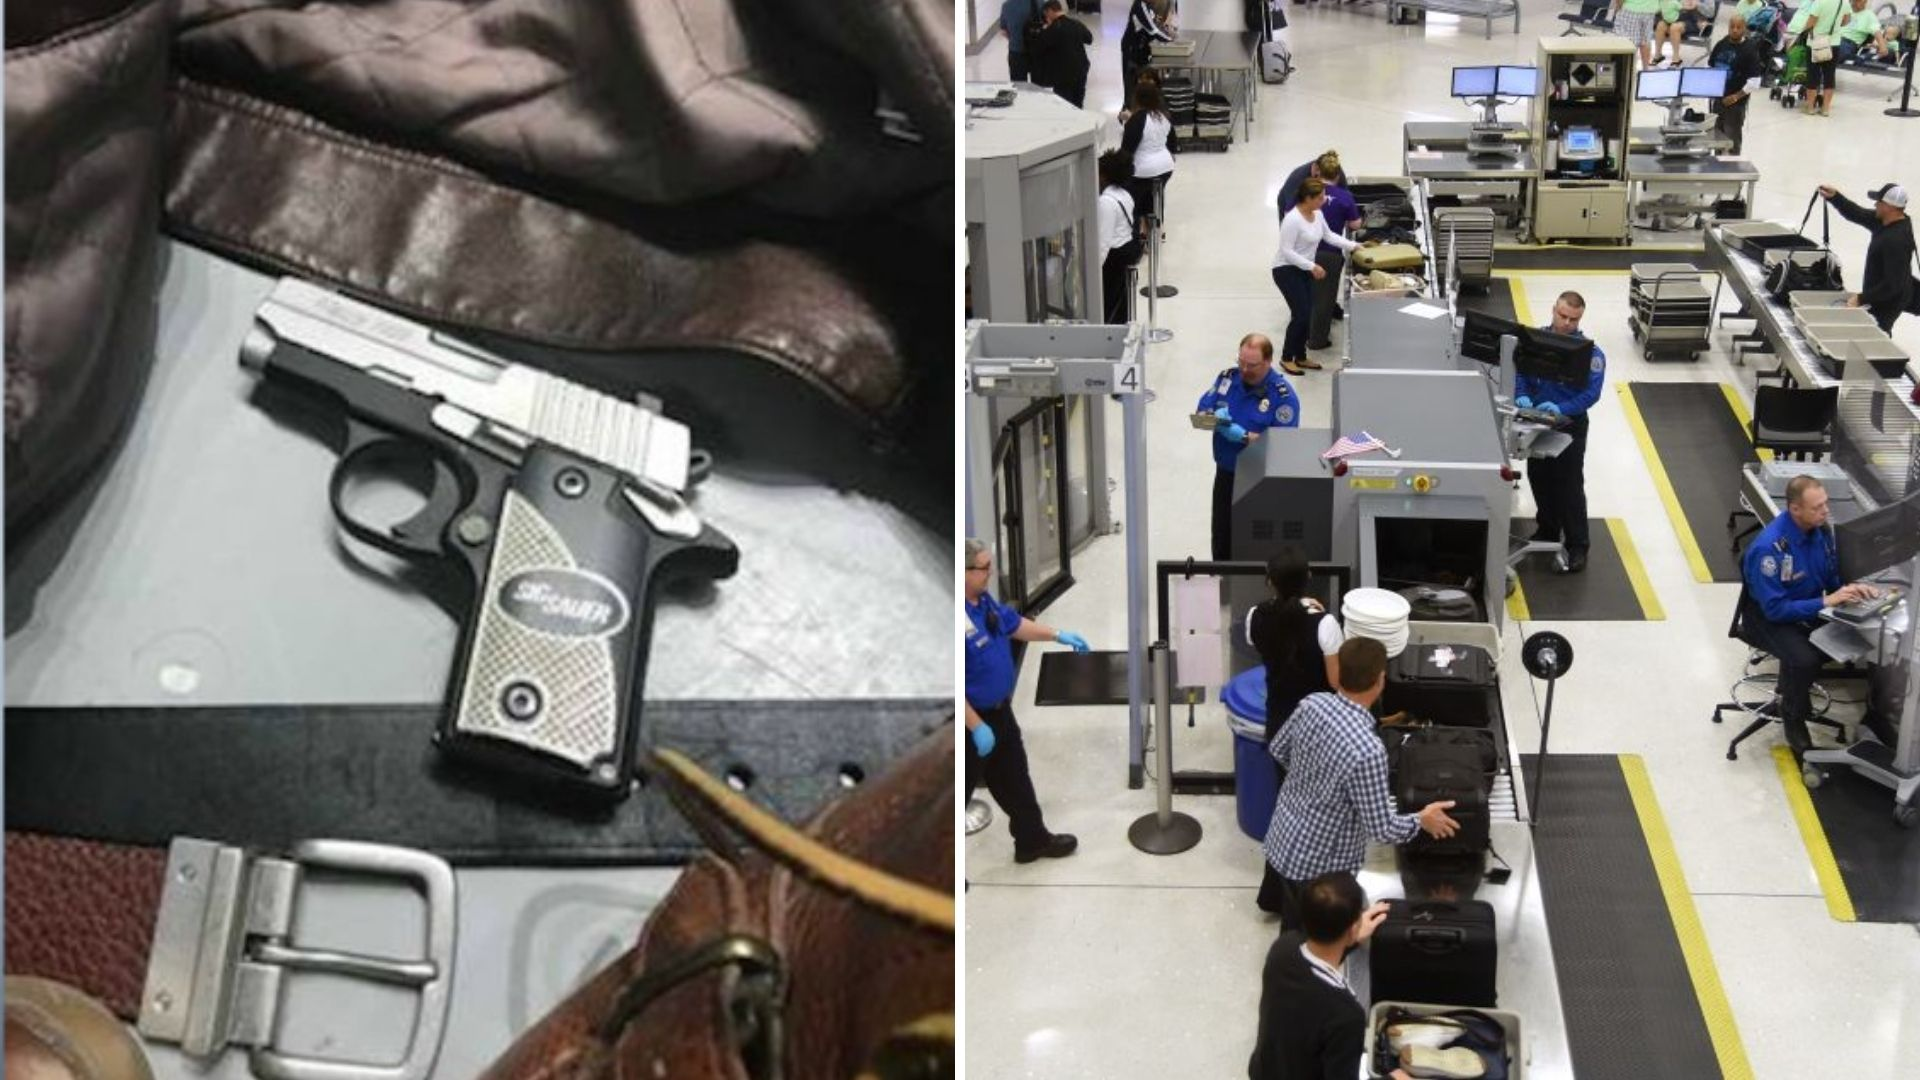 Guns found more often at airpot security in 2020: TSA